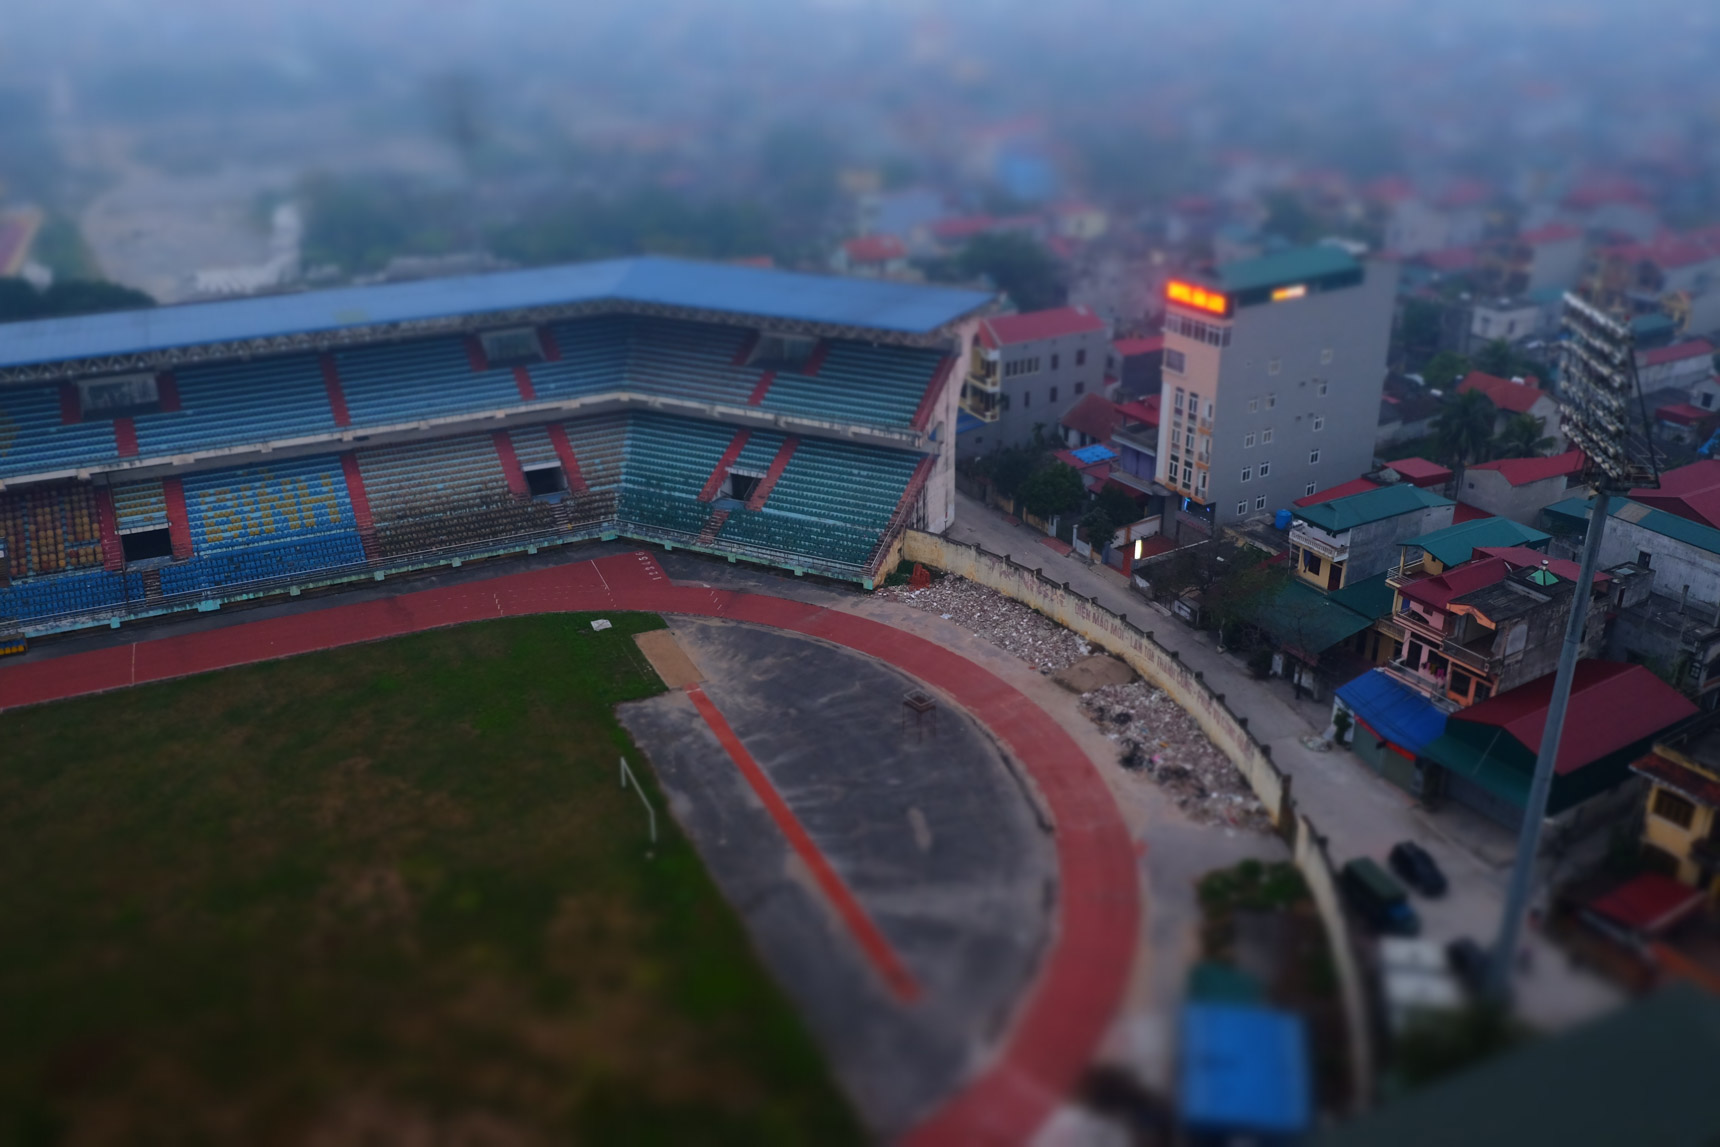 Ninh Binh Stadium